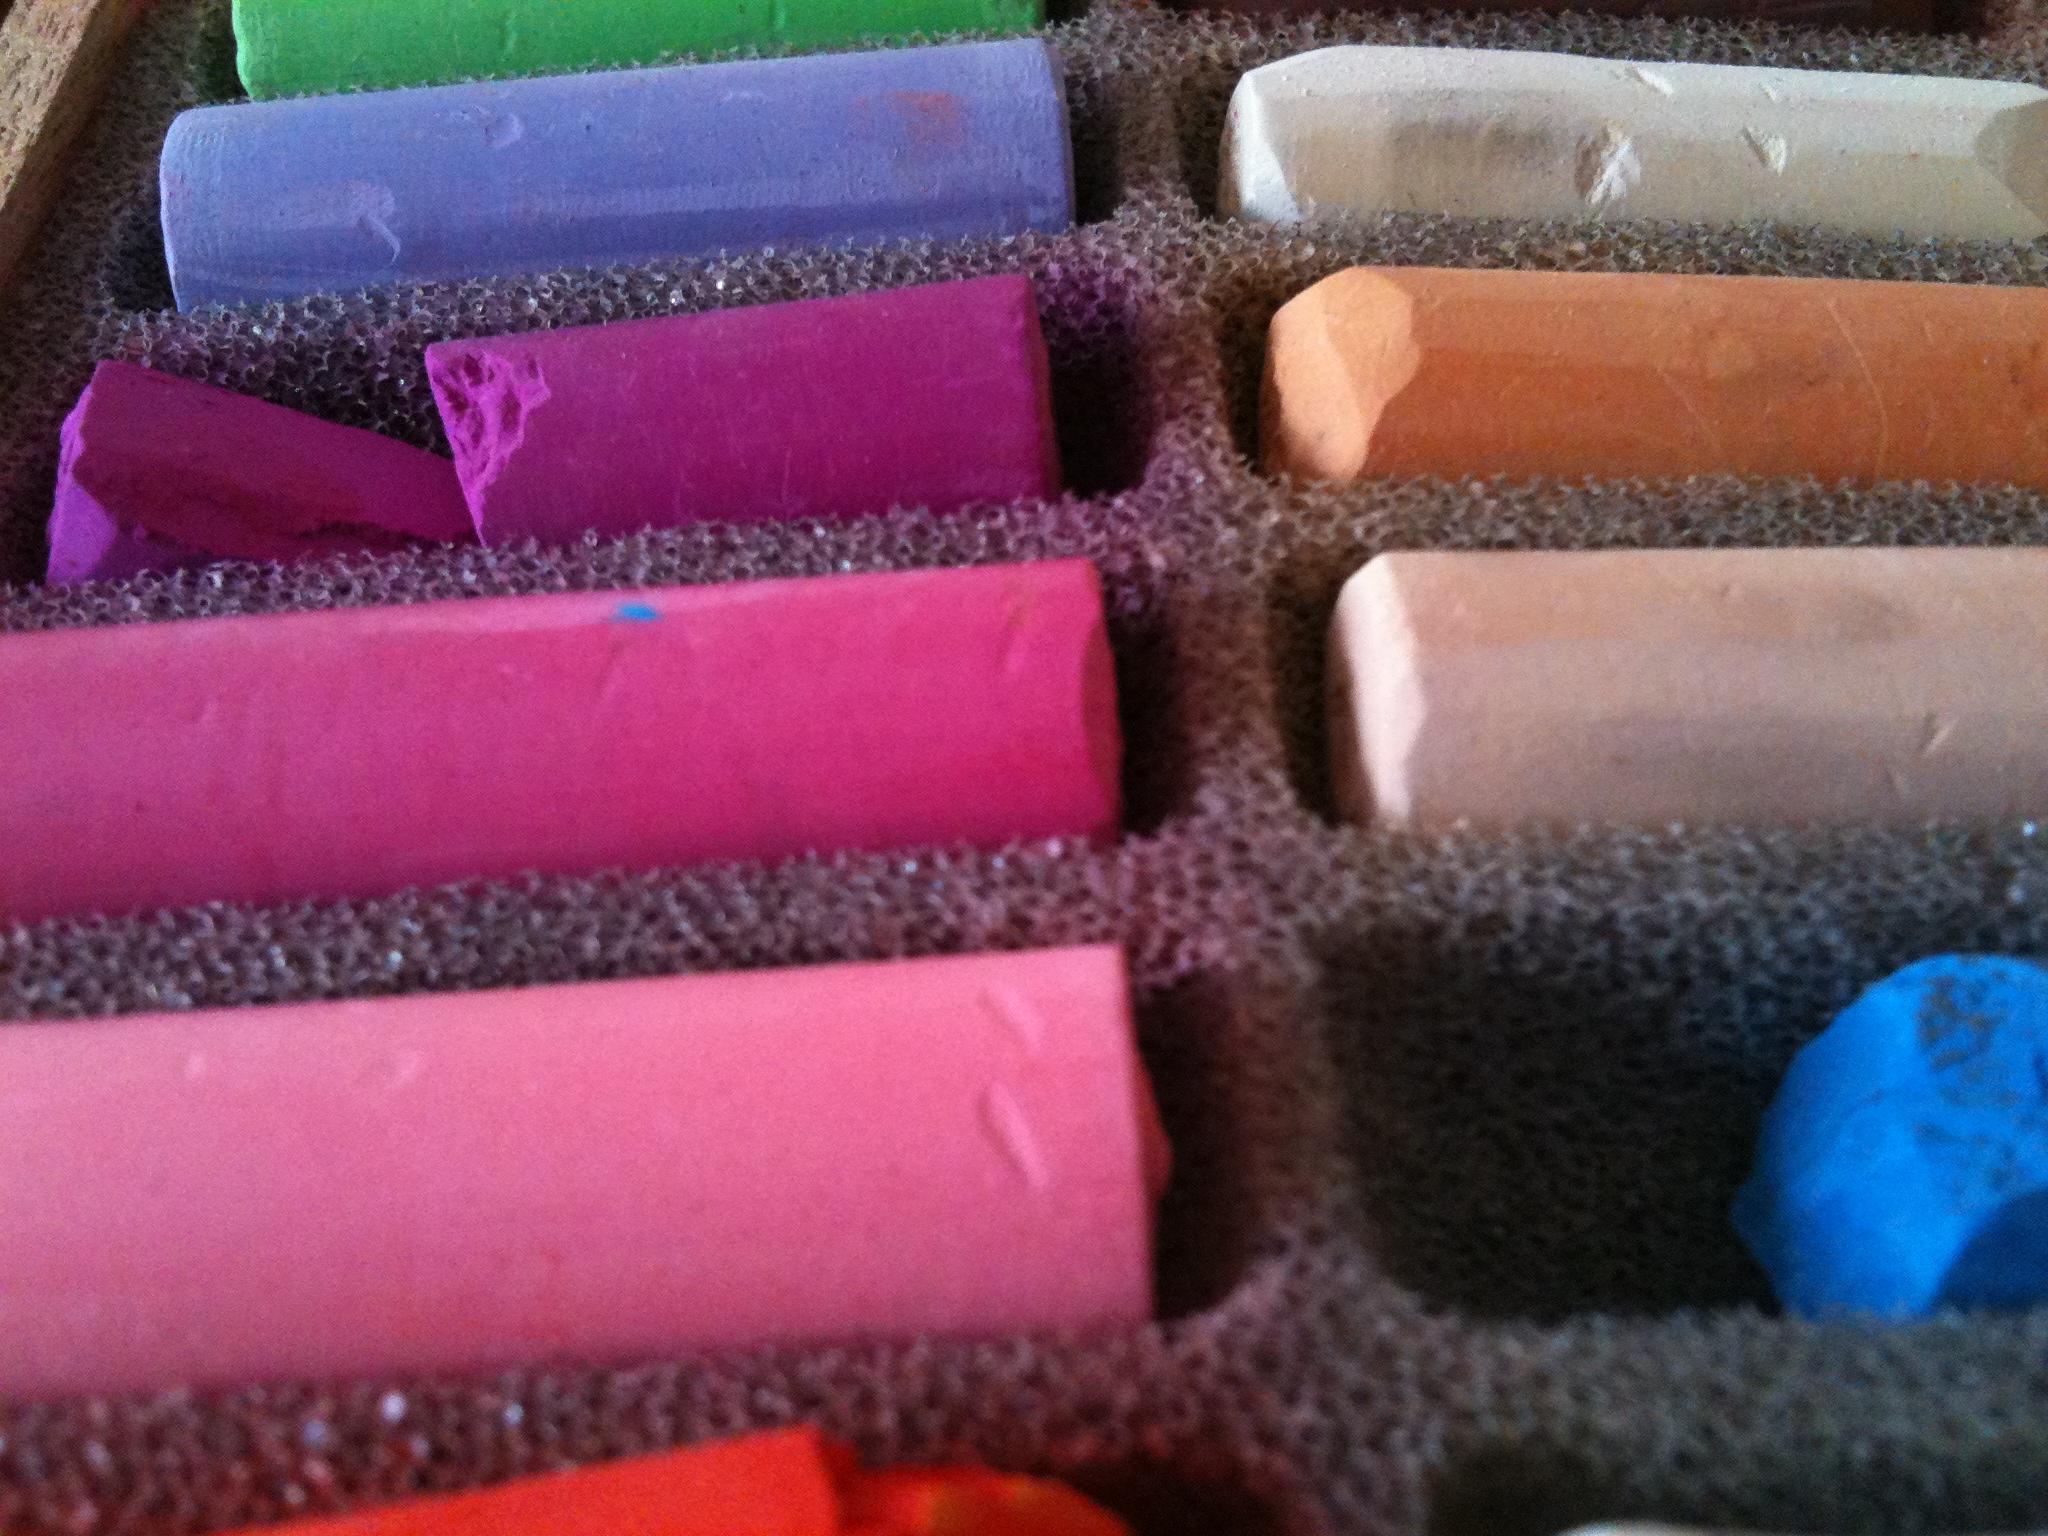 Pastel Colors, Art, Artist, Blue, Chipped, HQ Photo